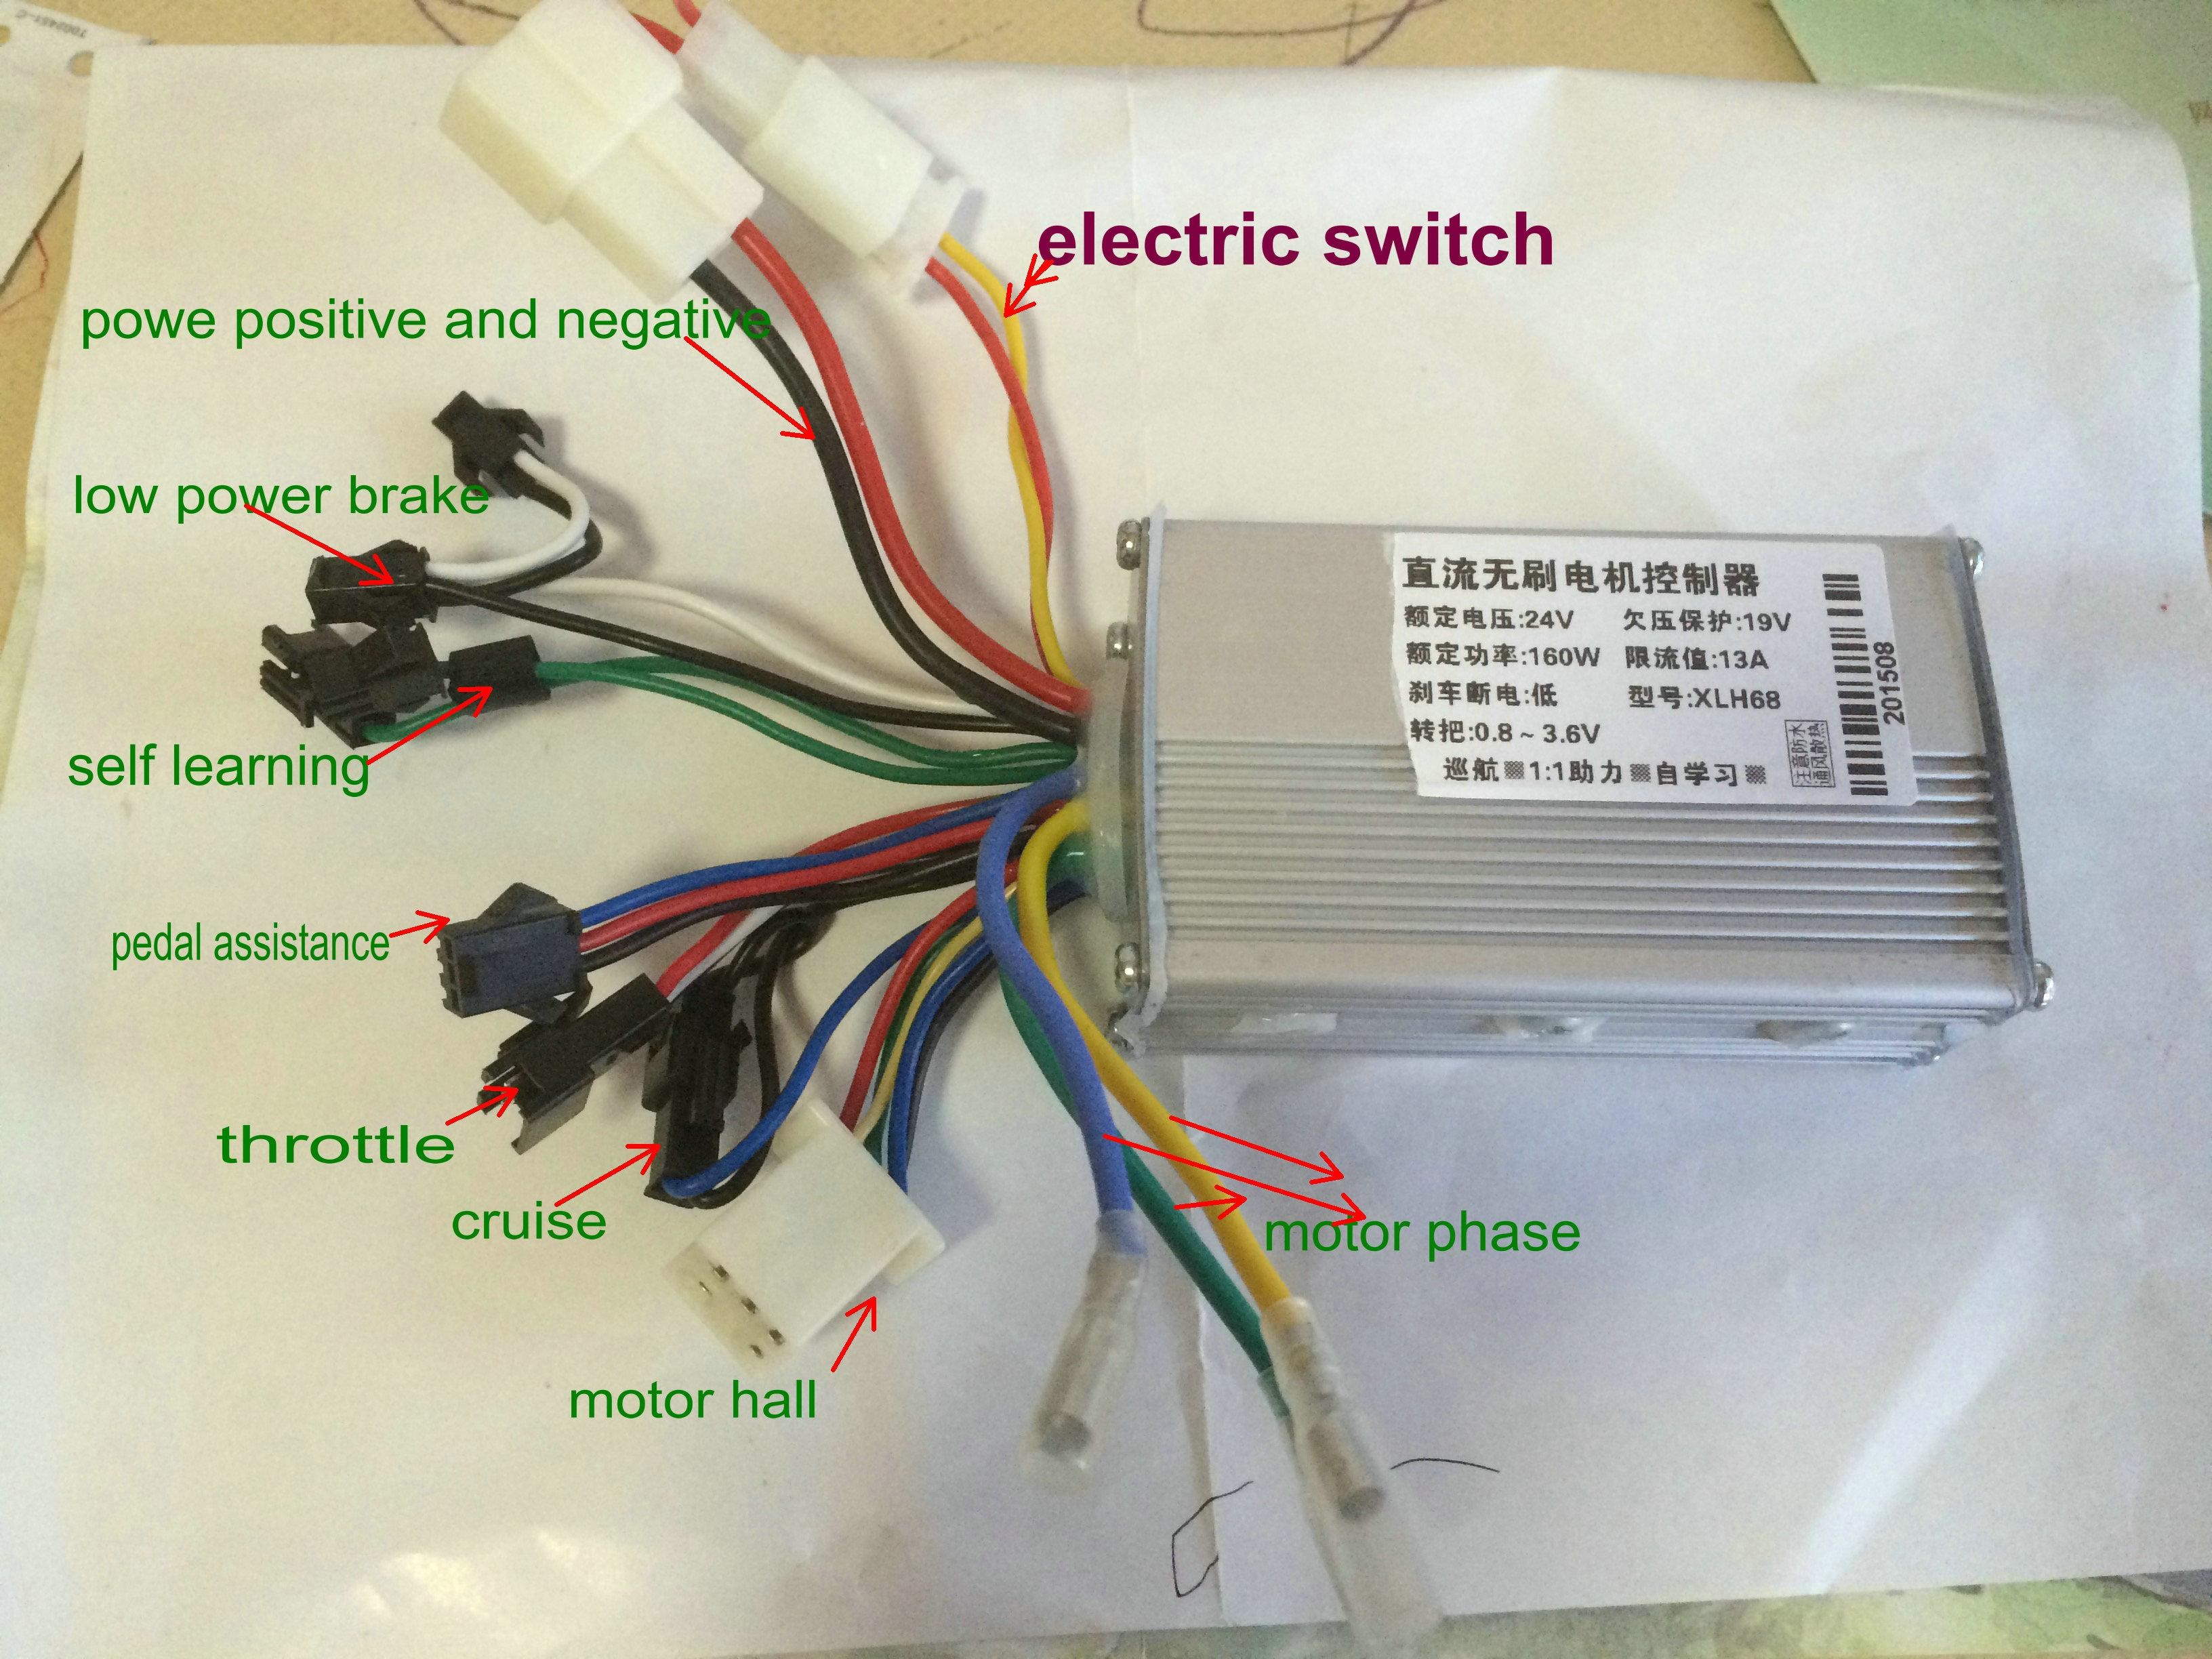 24v36v48v 250w350w bldc motor speed controller